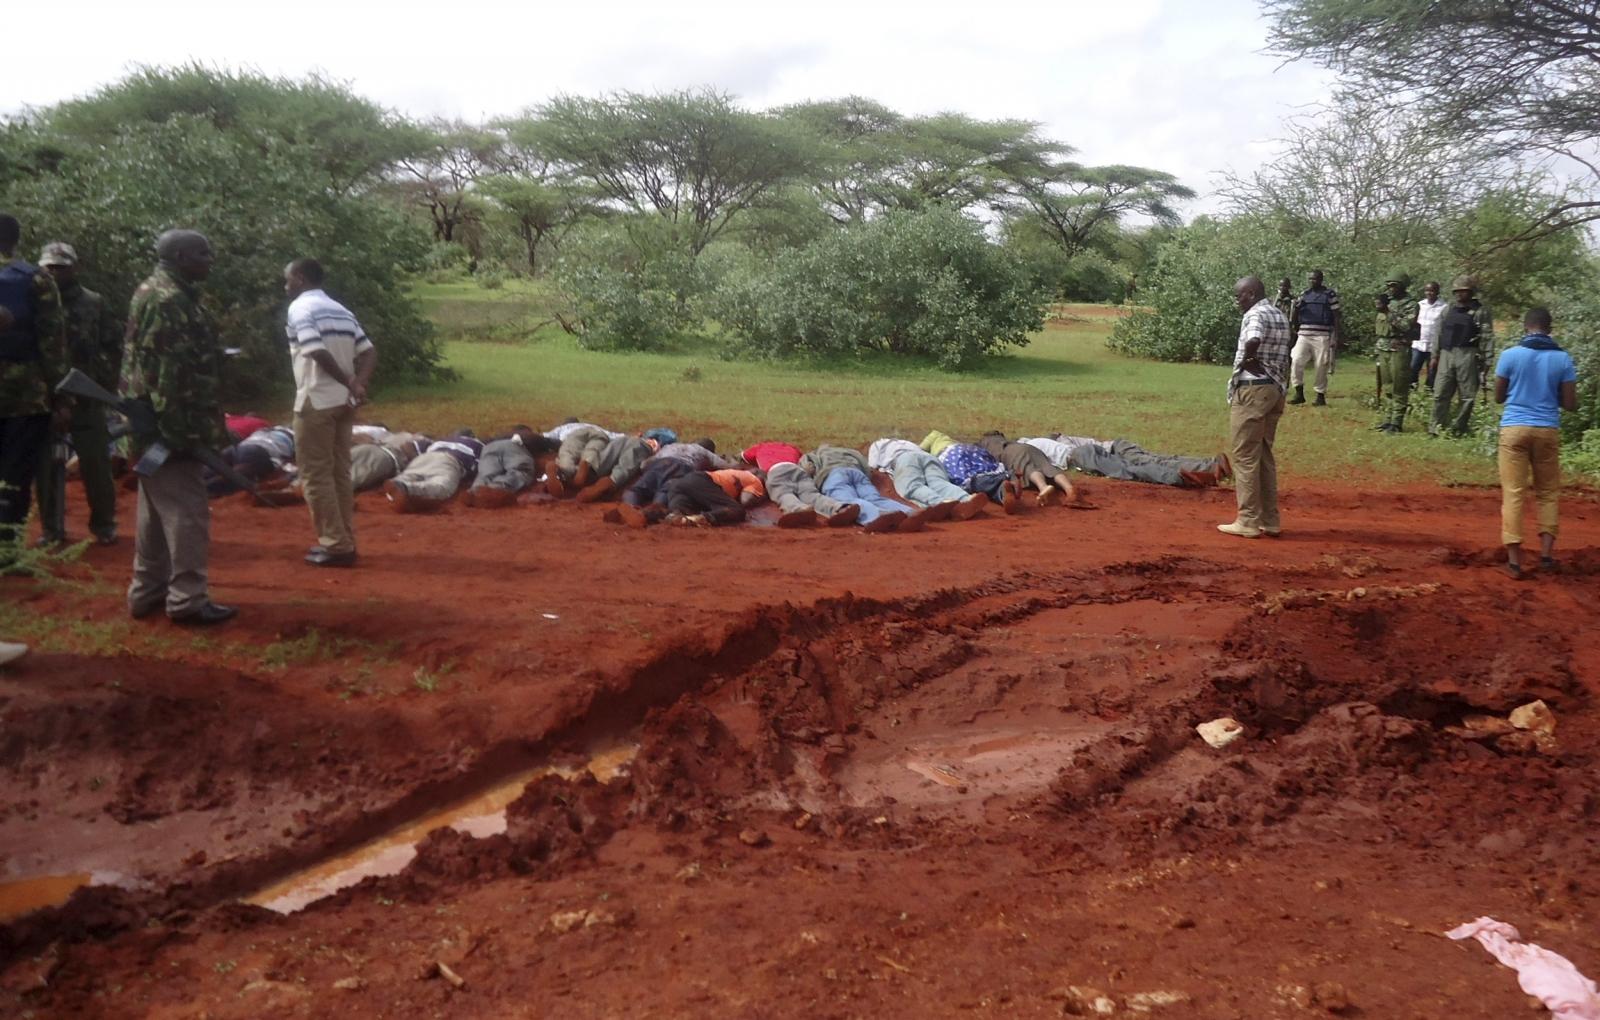 Kenya bus attack by al-Shabaab militants